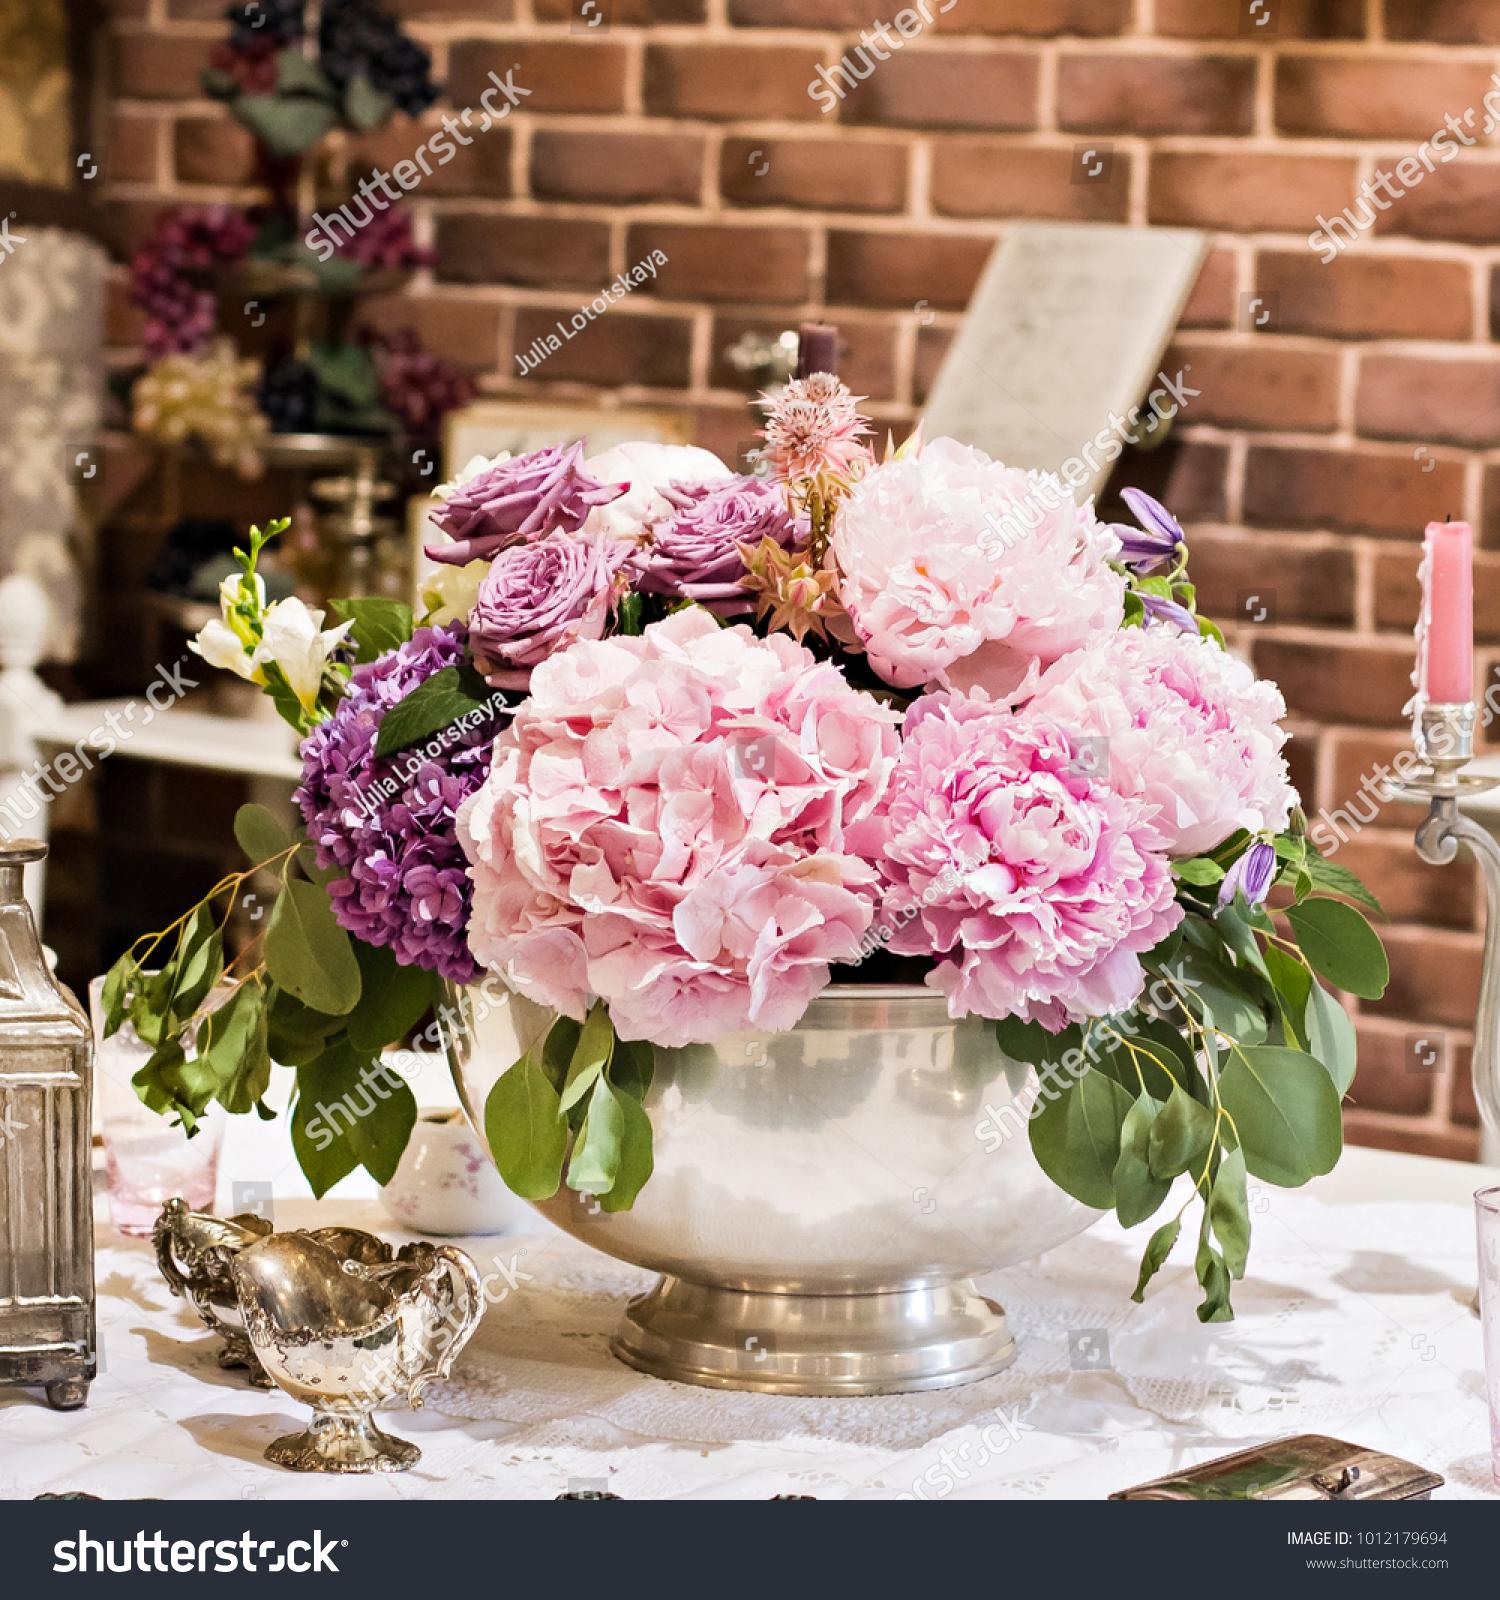 Hydrangeas Beautiful Purple Hydrangea Flowers Closeup Nature Stock Image 1012179694